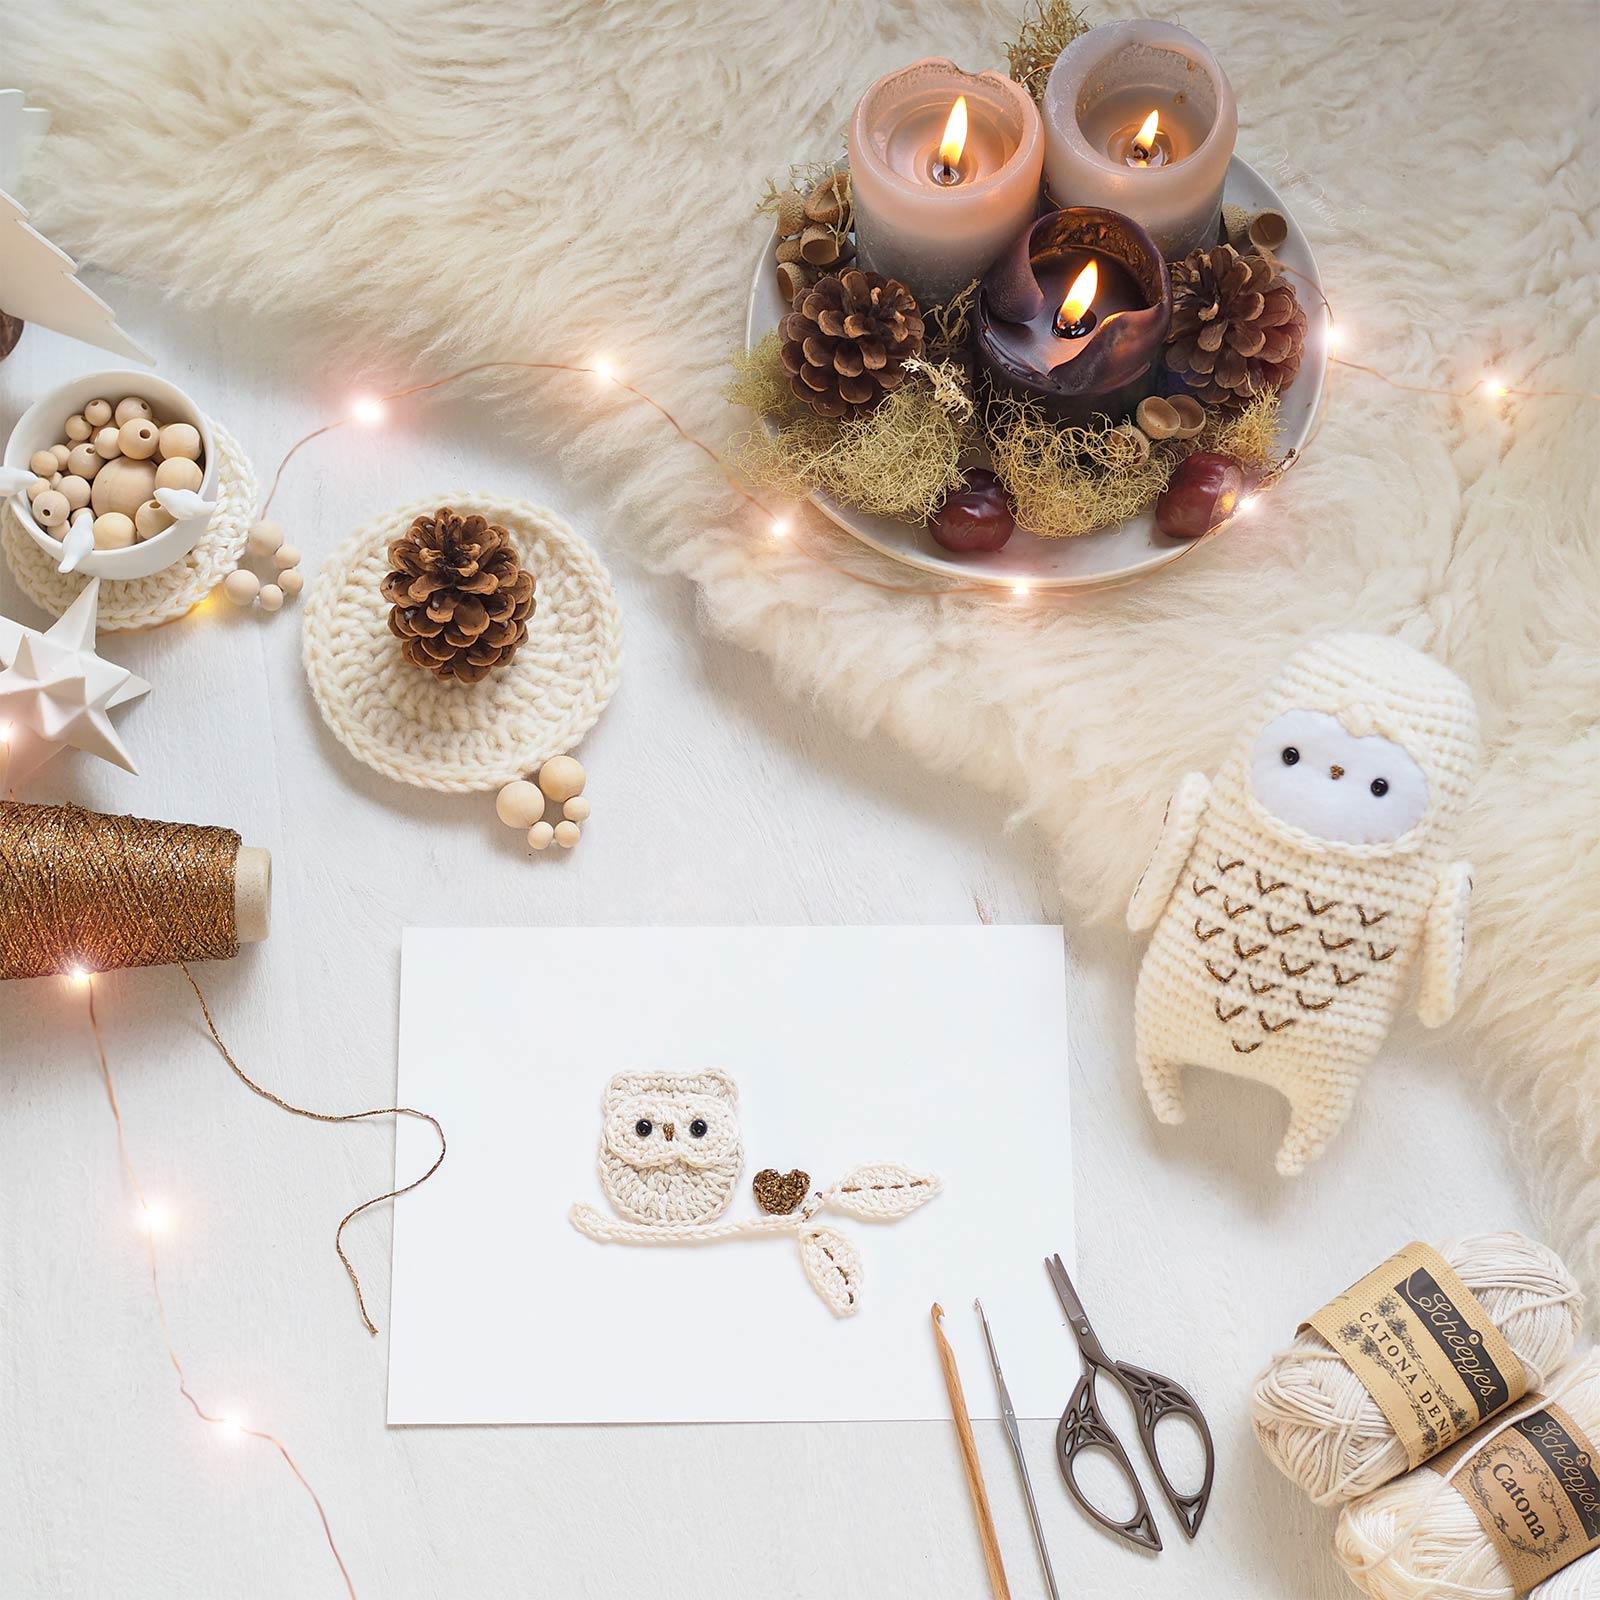 illustration crochet chouette hedwige harfang neige cadeau noël christmas laboutiquedemelimelo